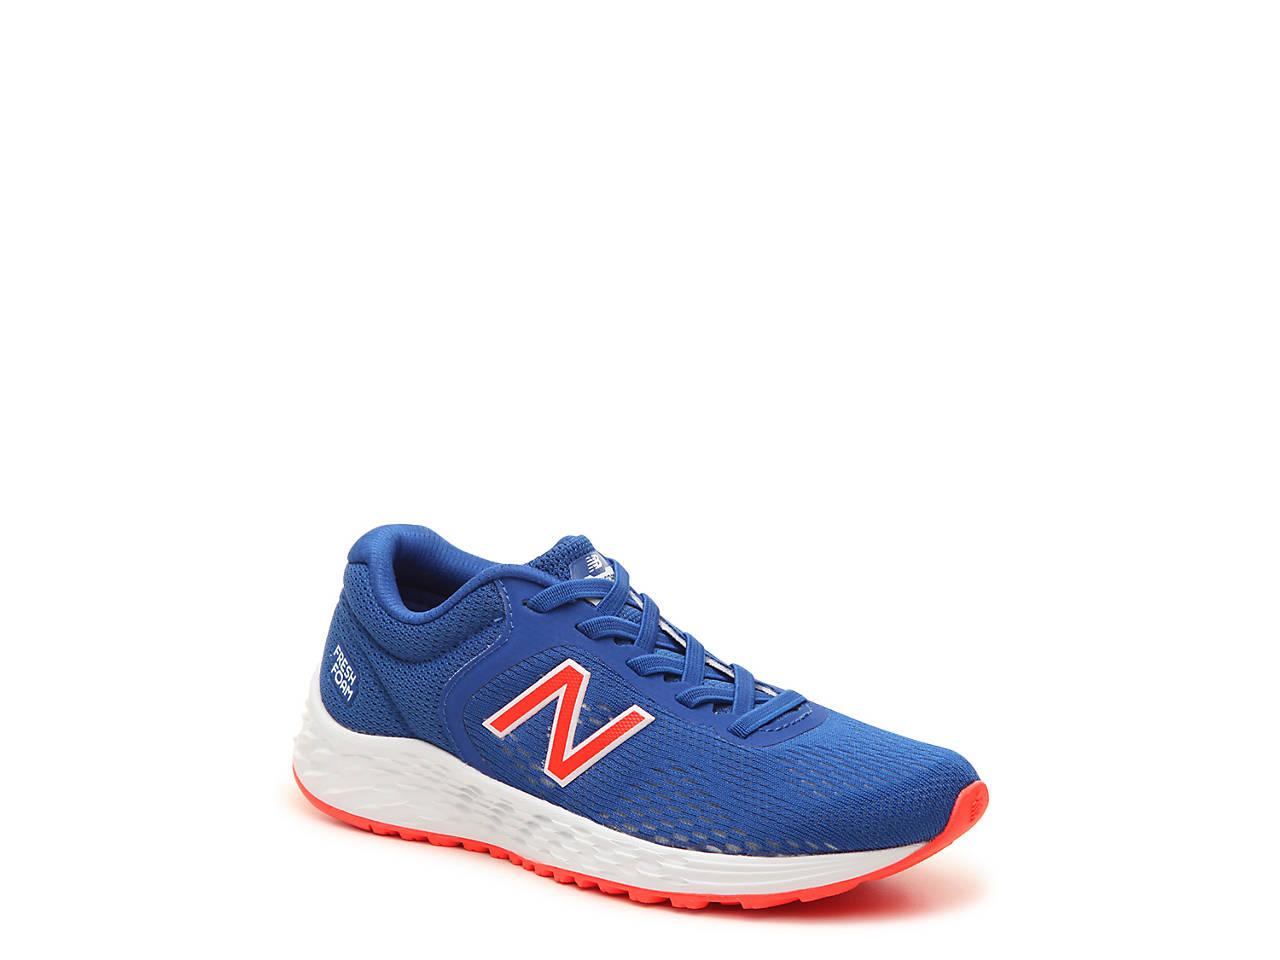 6d5afcc857cc8 New Balance Fresh Foam Arishi v2 Toddler & Youth Running Shoe Kids ...